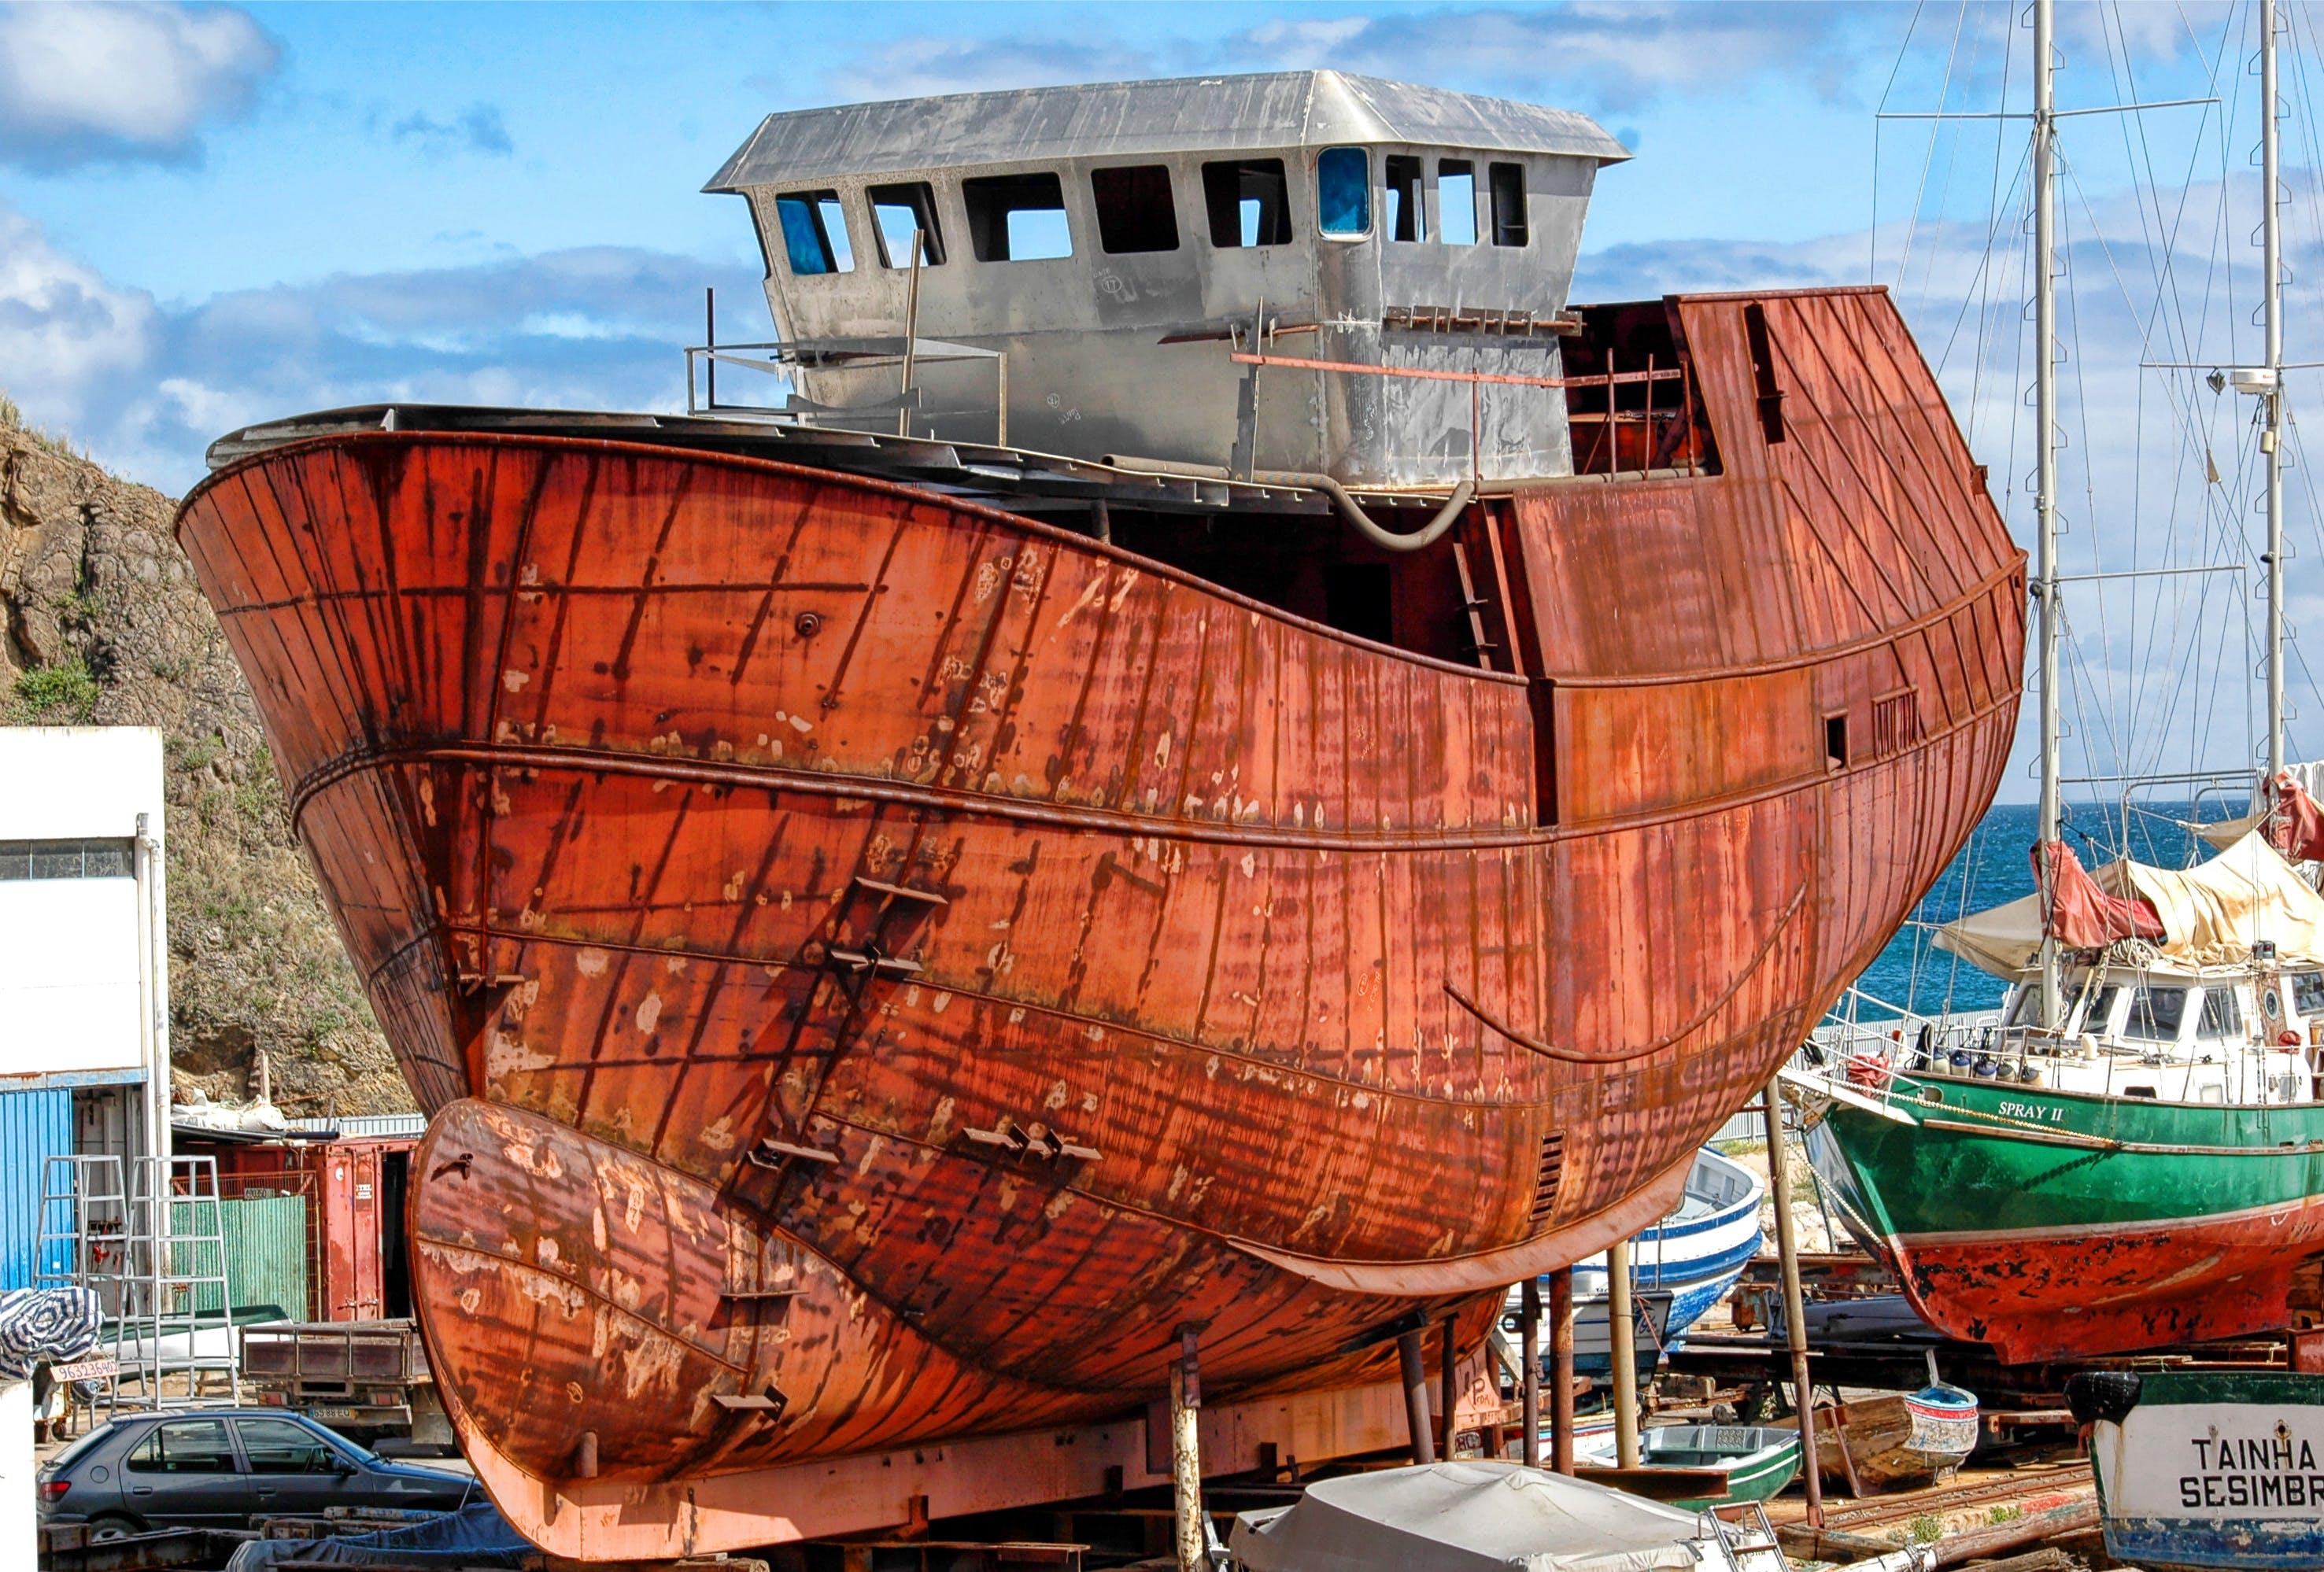 Free stock photo of Ark of Noah, boat, fishing boat, maritime